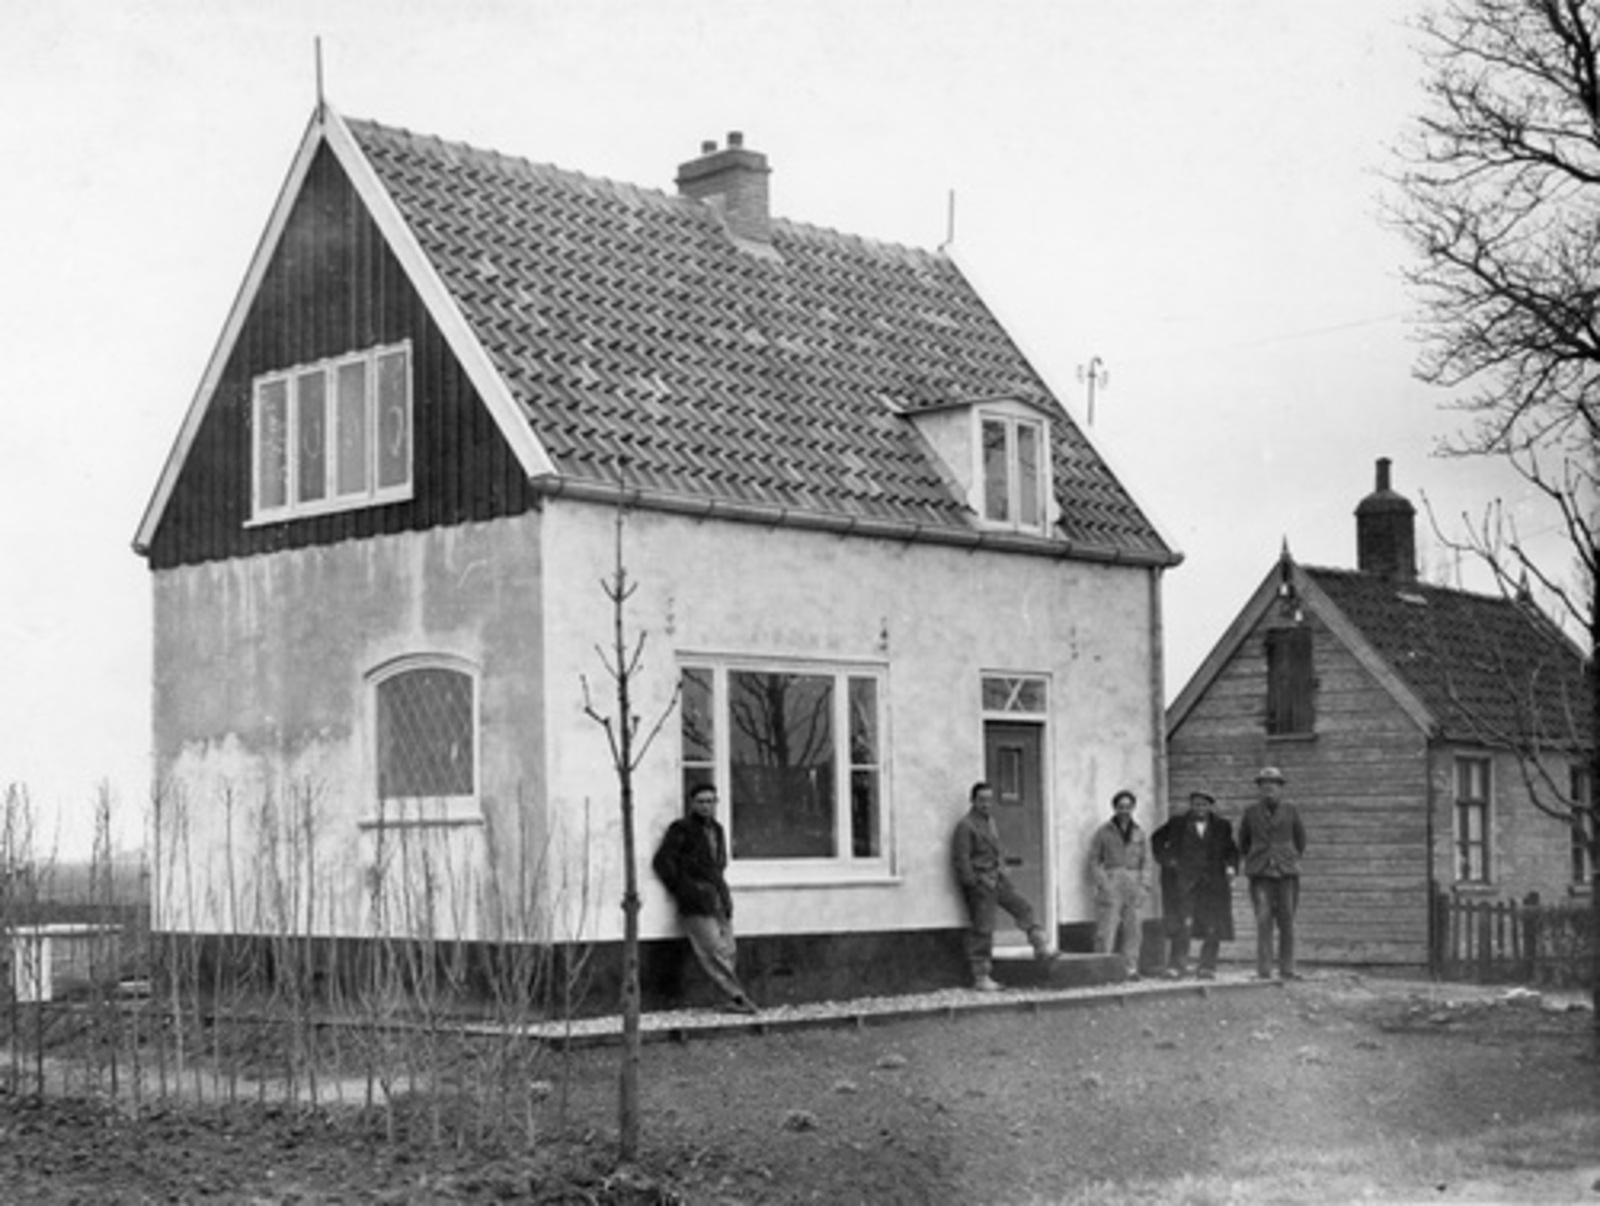 Rijnlanderweg W 0861 1953 Oud en Nieuwbouw Kaslander 02_2